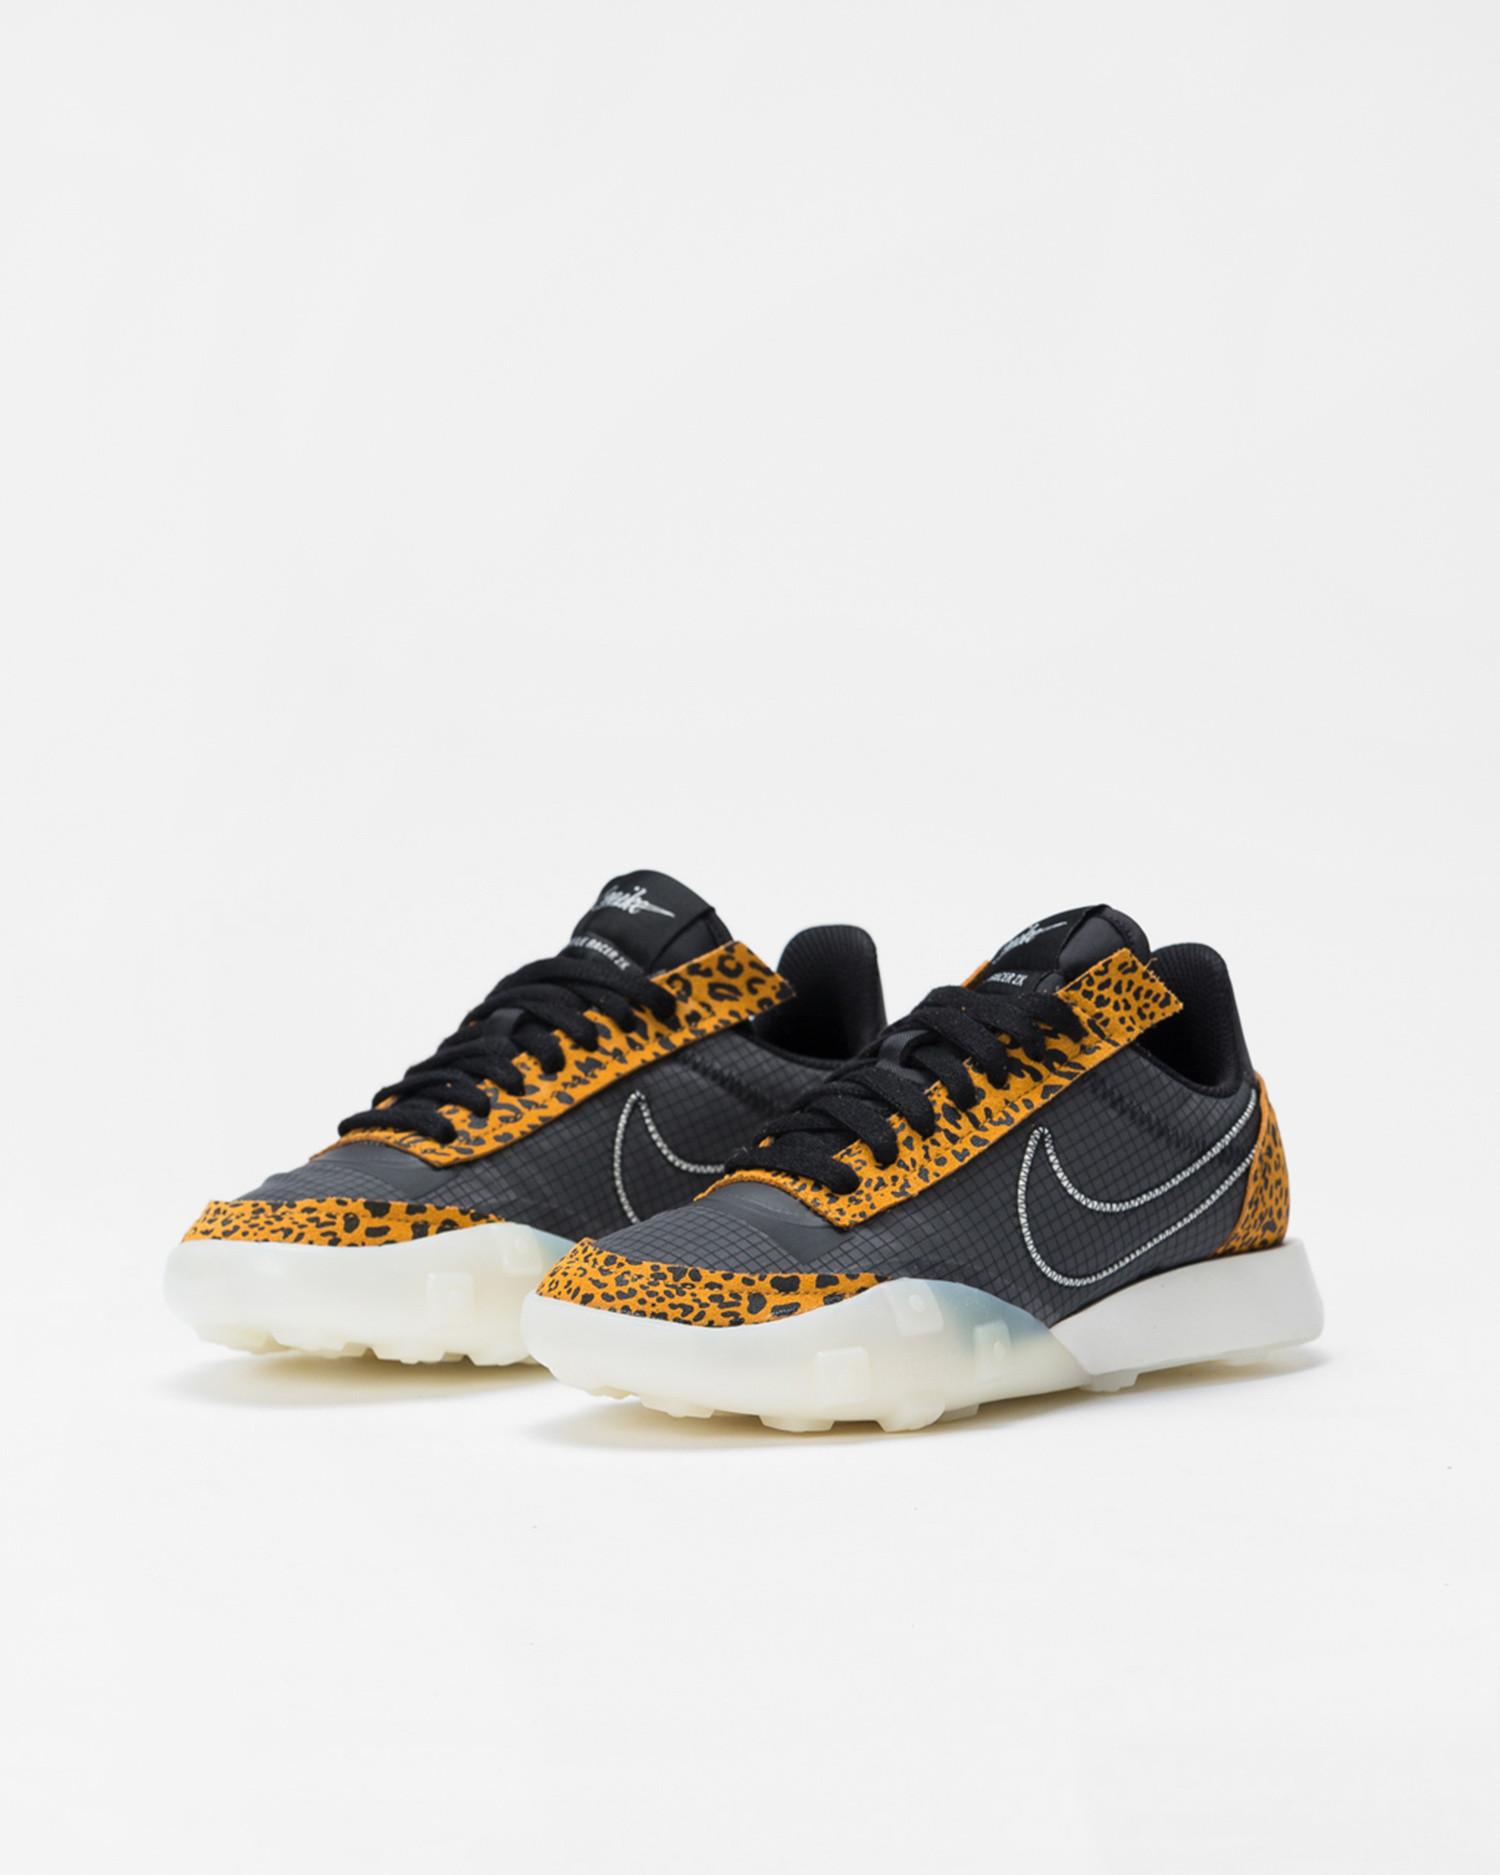 Nike Wmns waffle racer 2x Black/sail-chutney